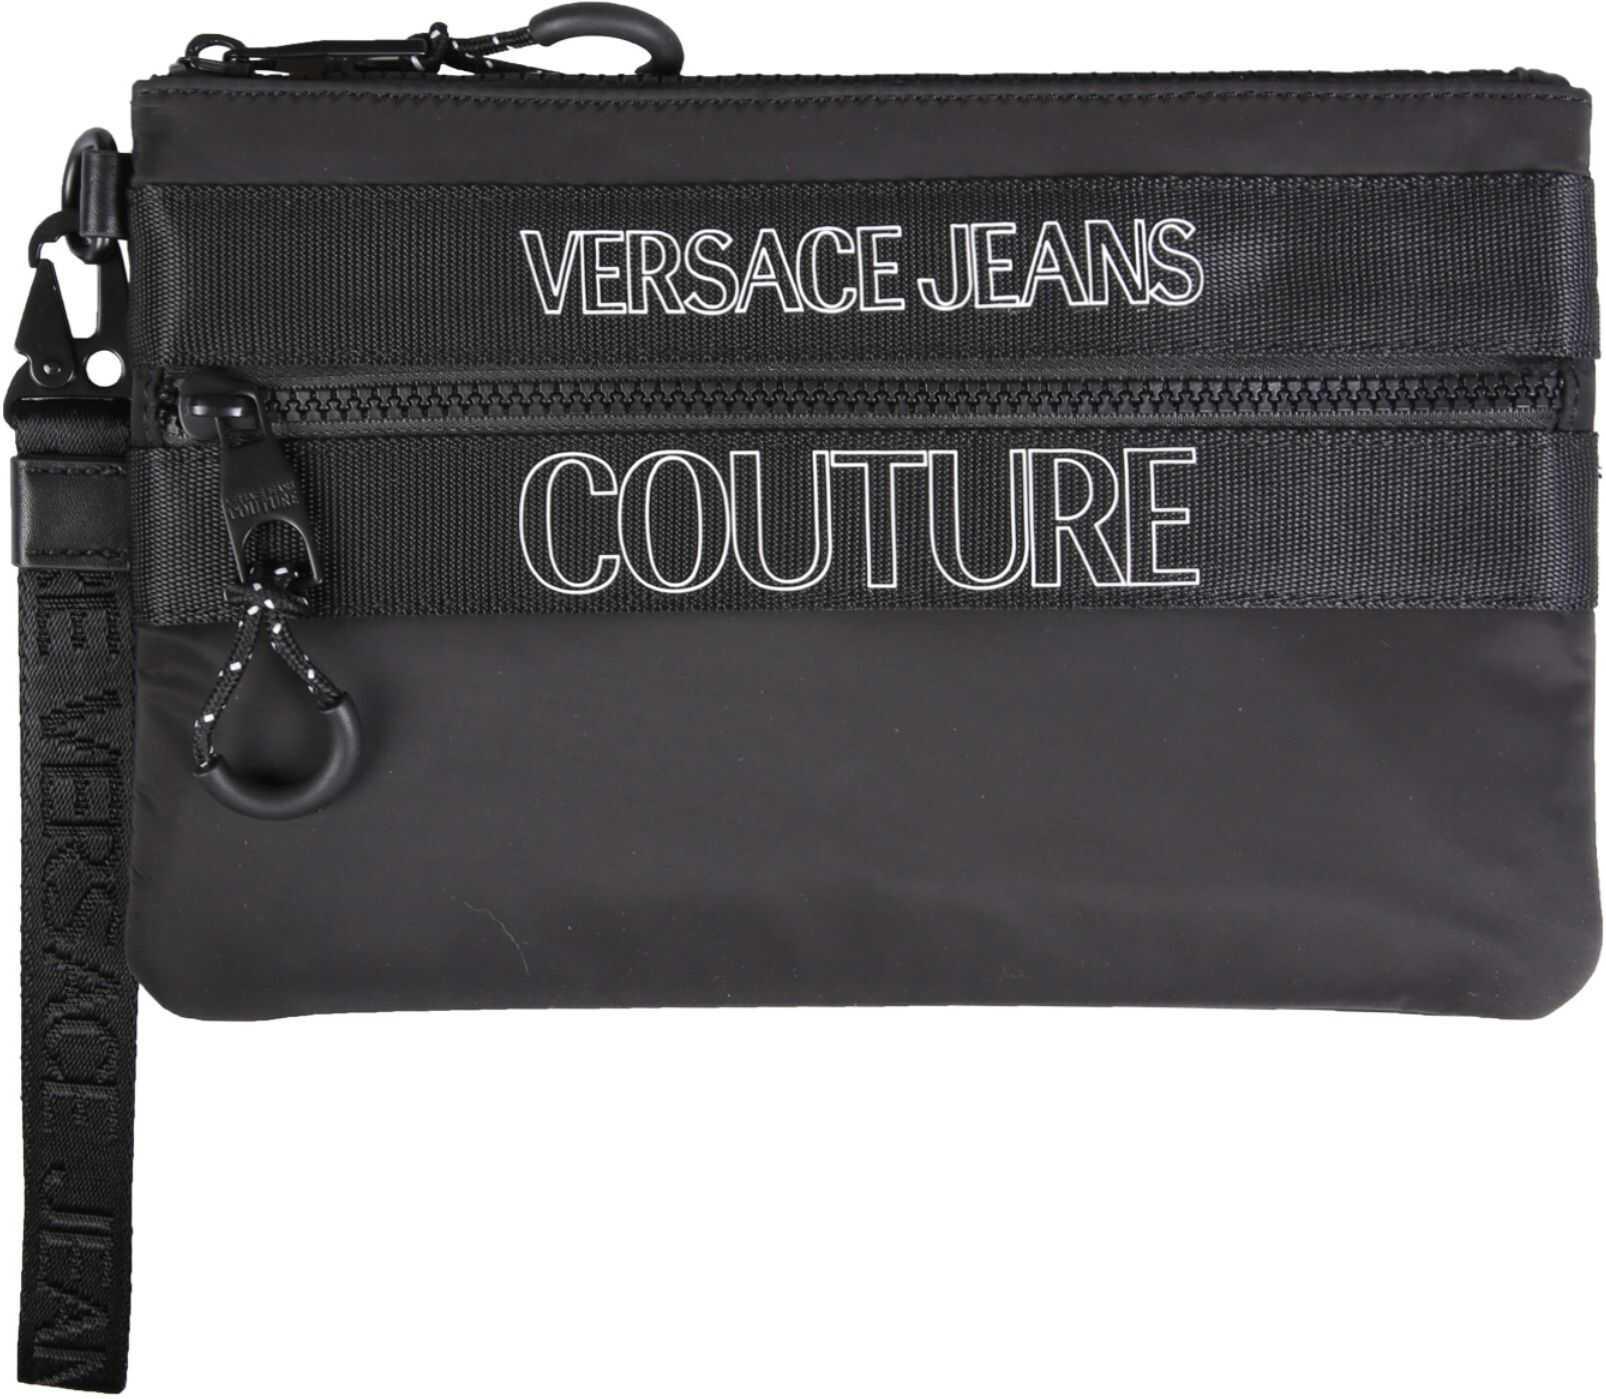 Versace Jeans Couture Nylon Pouch With Logo E3YWAPA2_71895899 BLACK imagine b-mall.ro